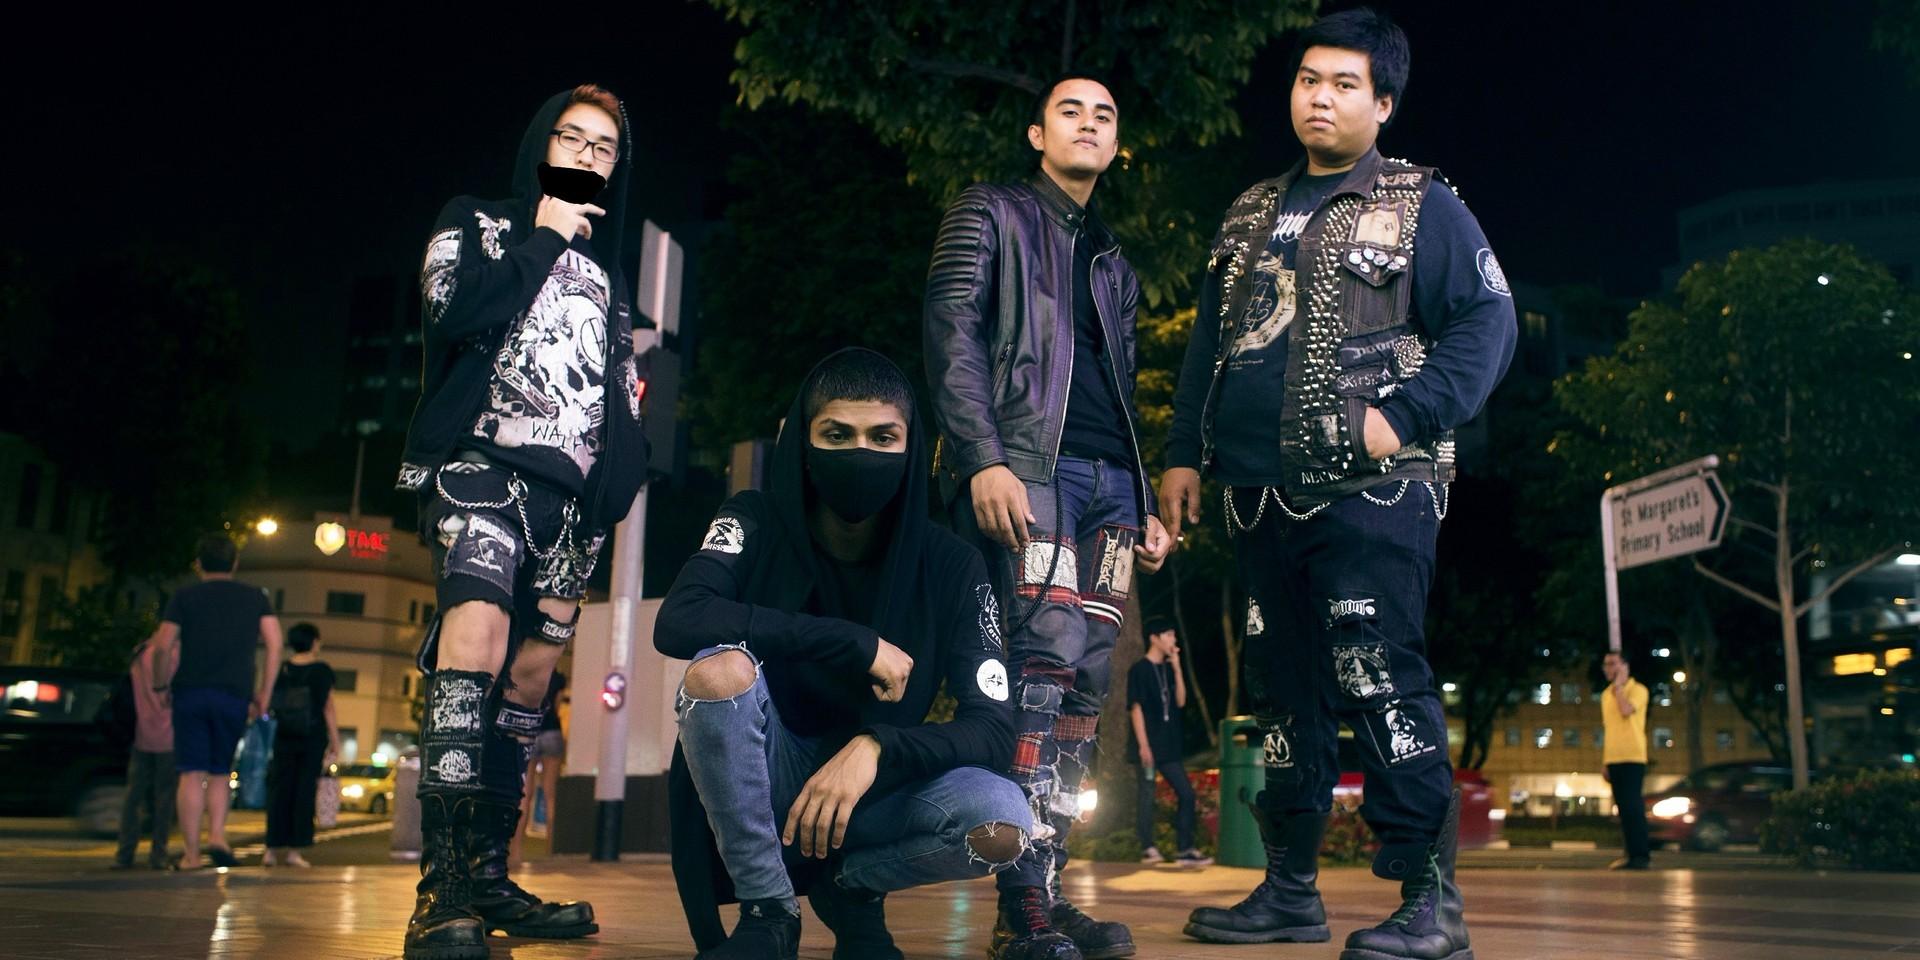 Gangrene's debut EP is a brief, blistering punk barrage – listen